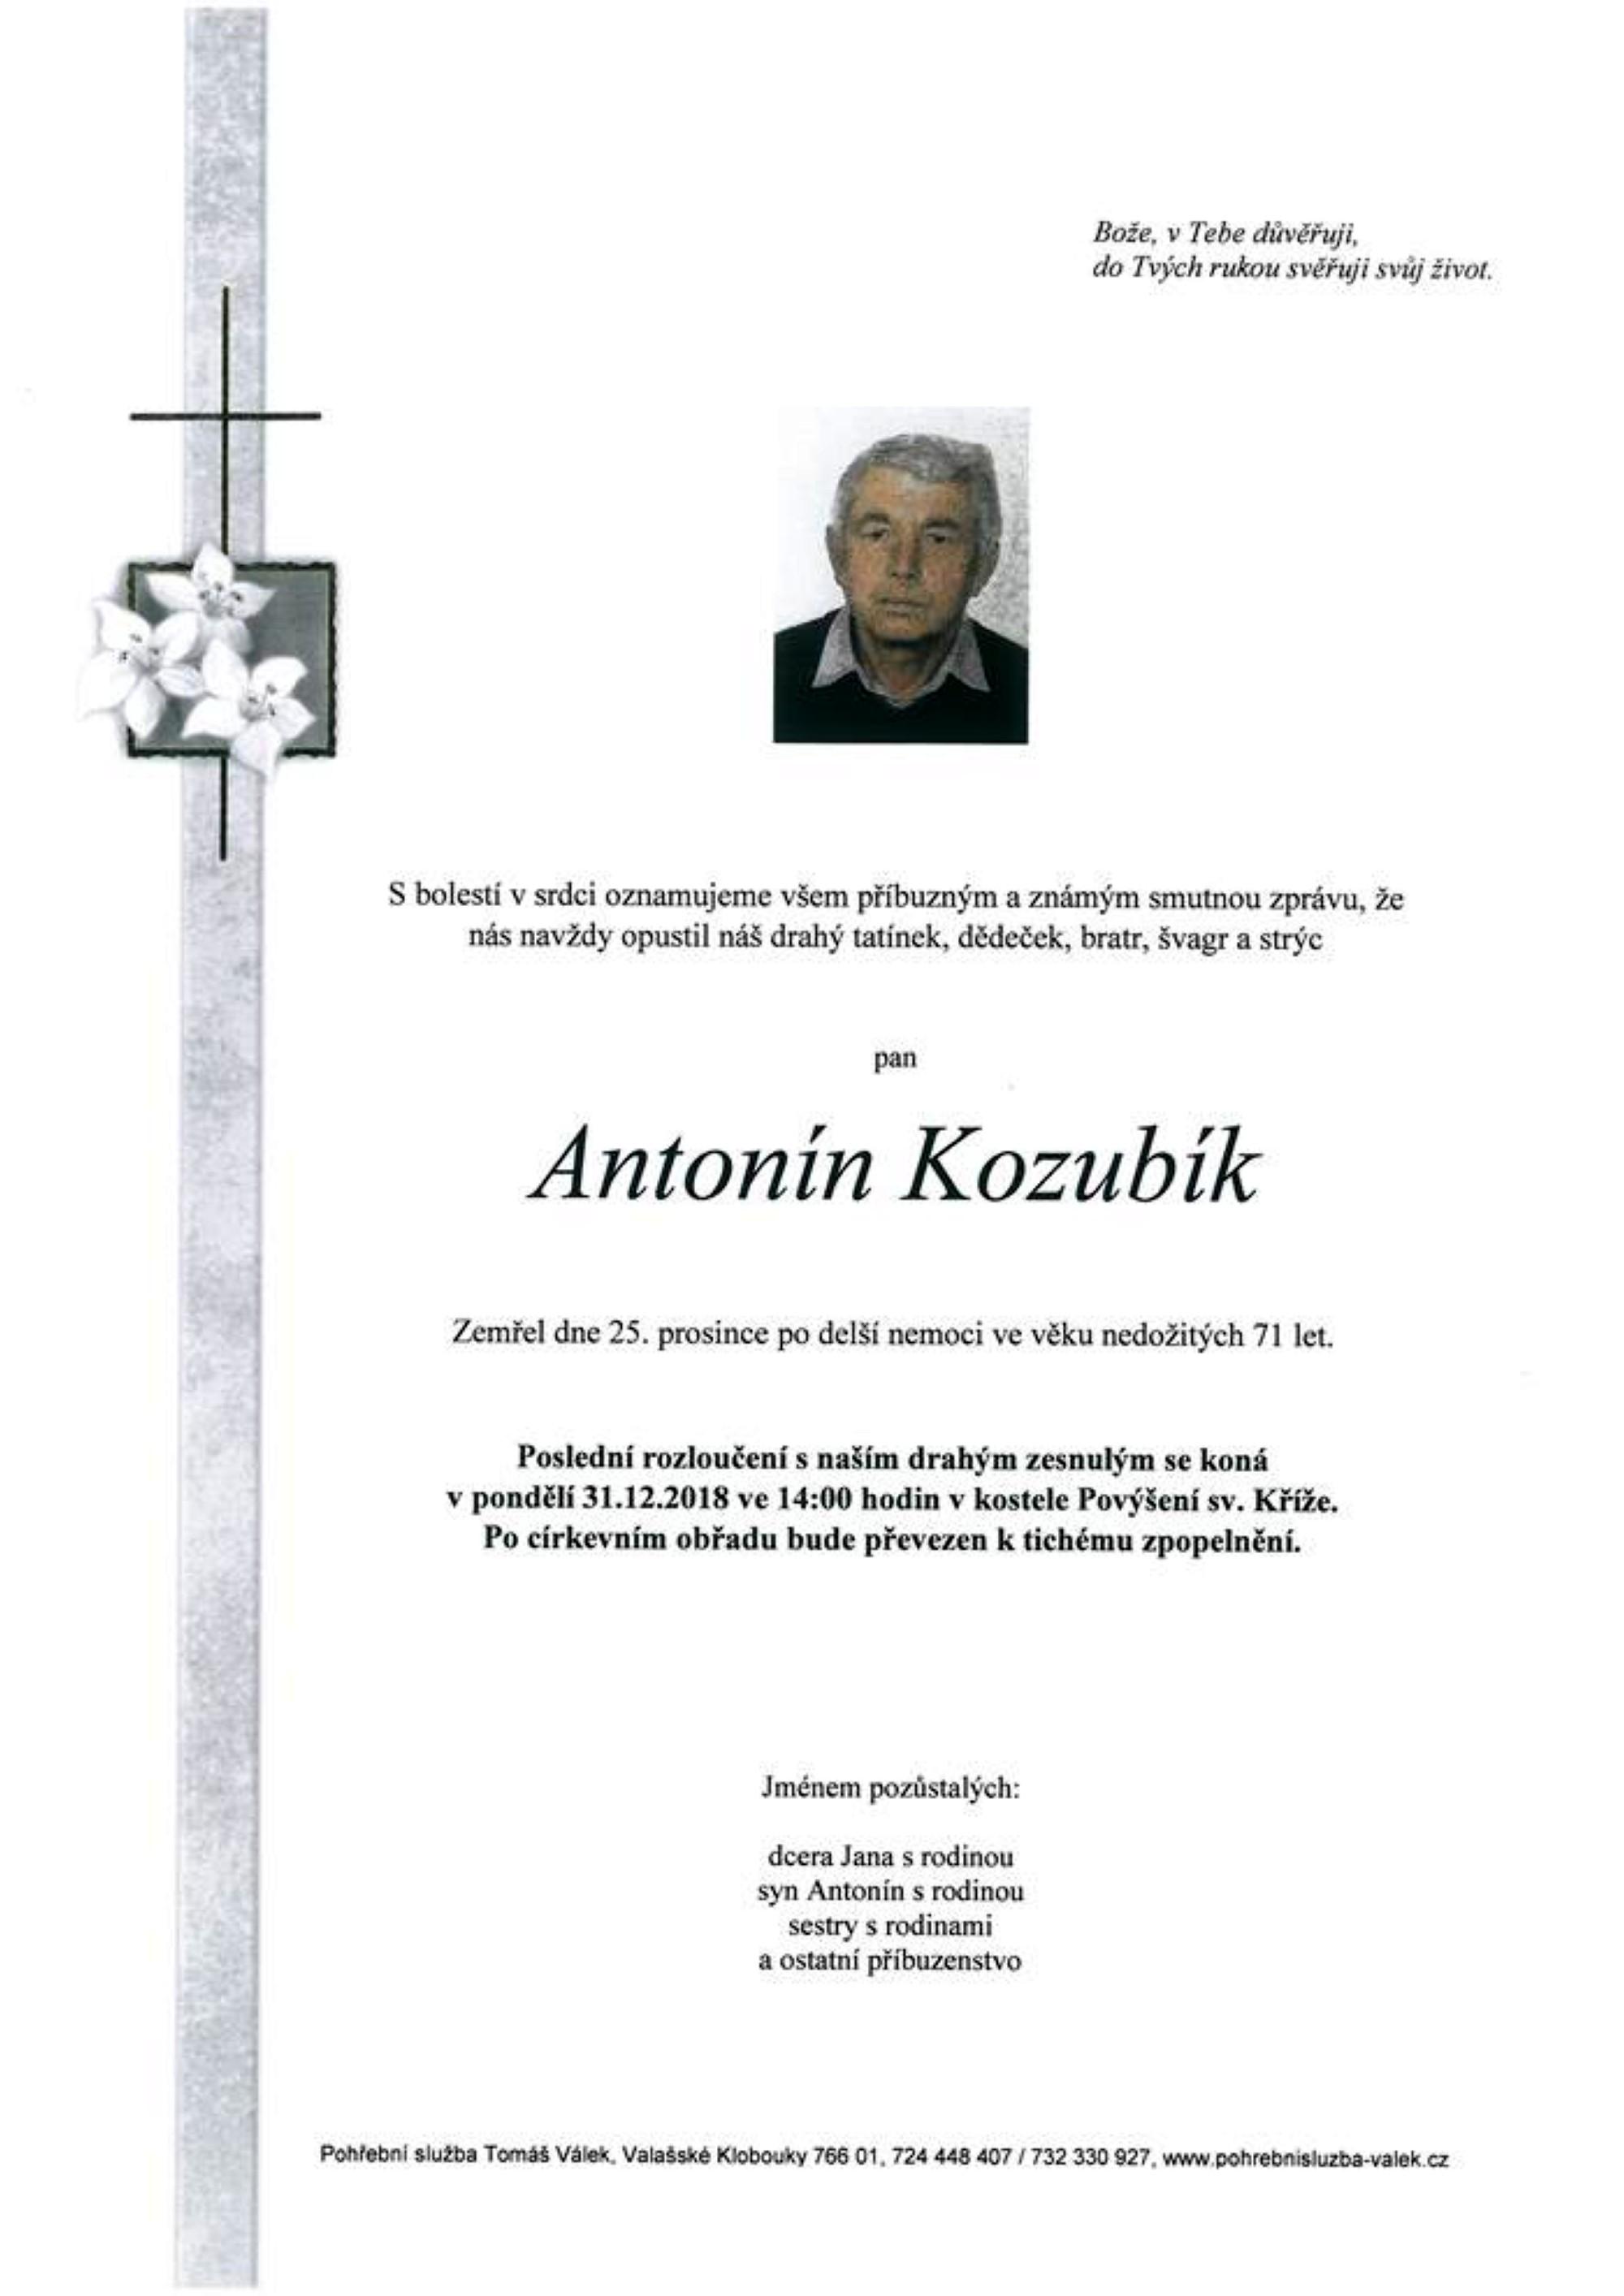 Antonín Kozubík